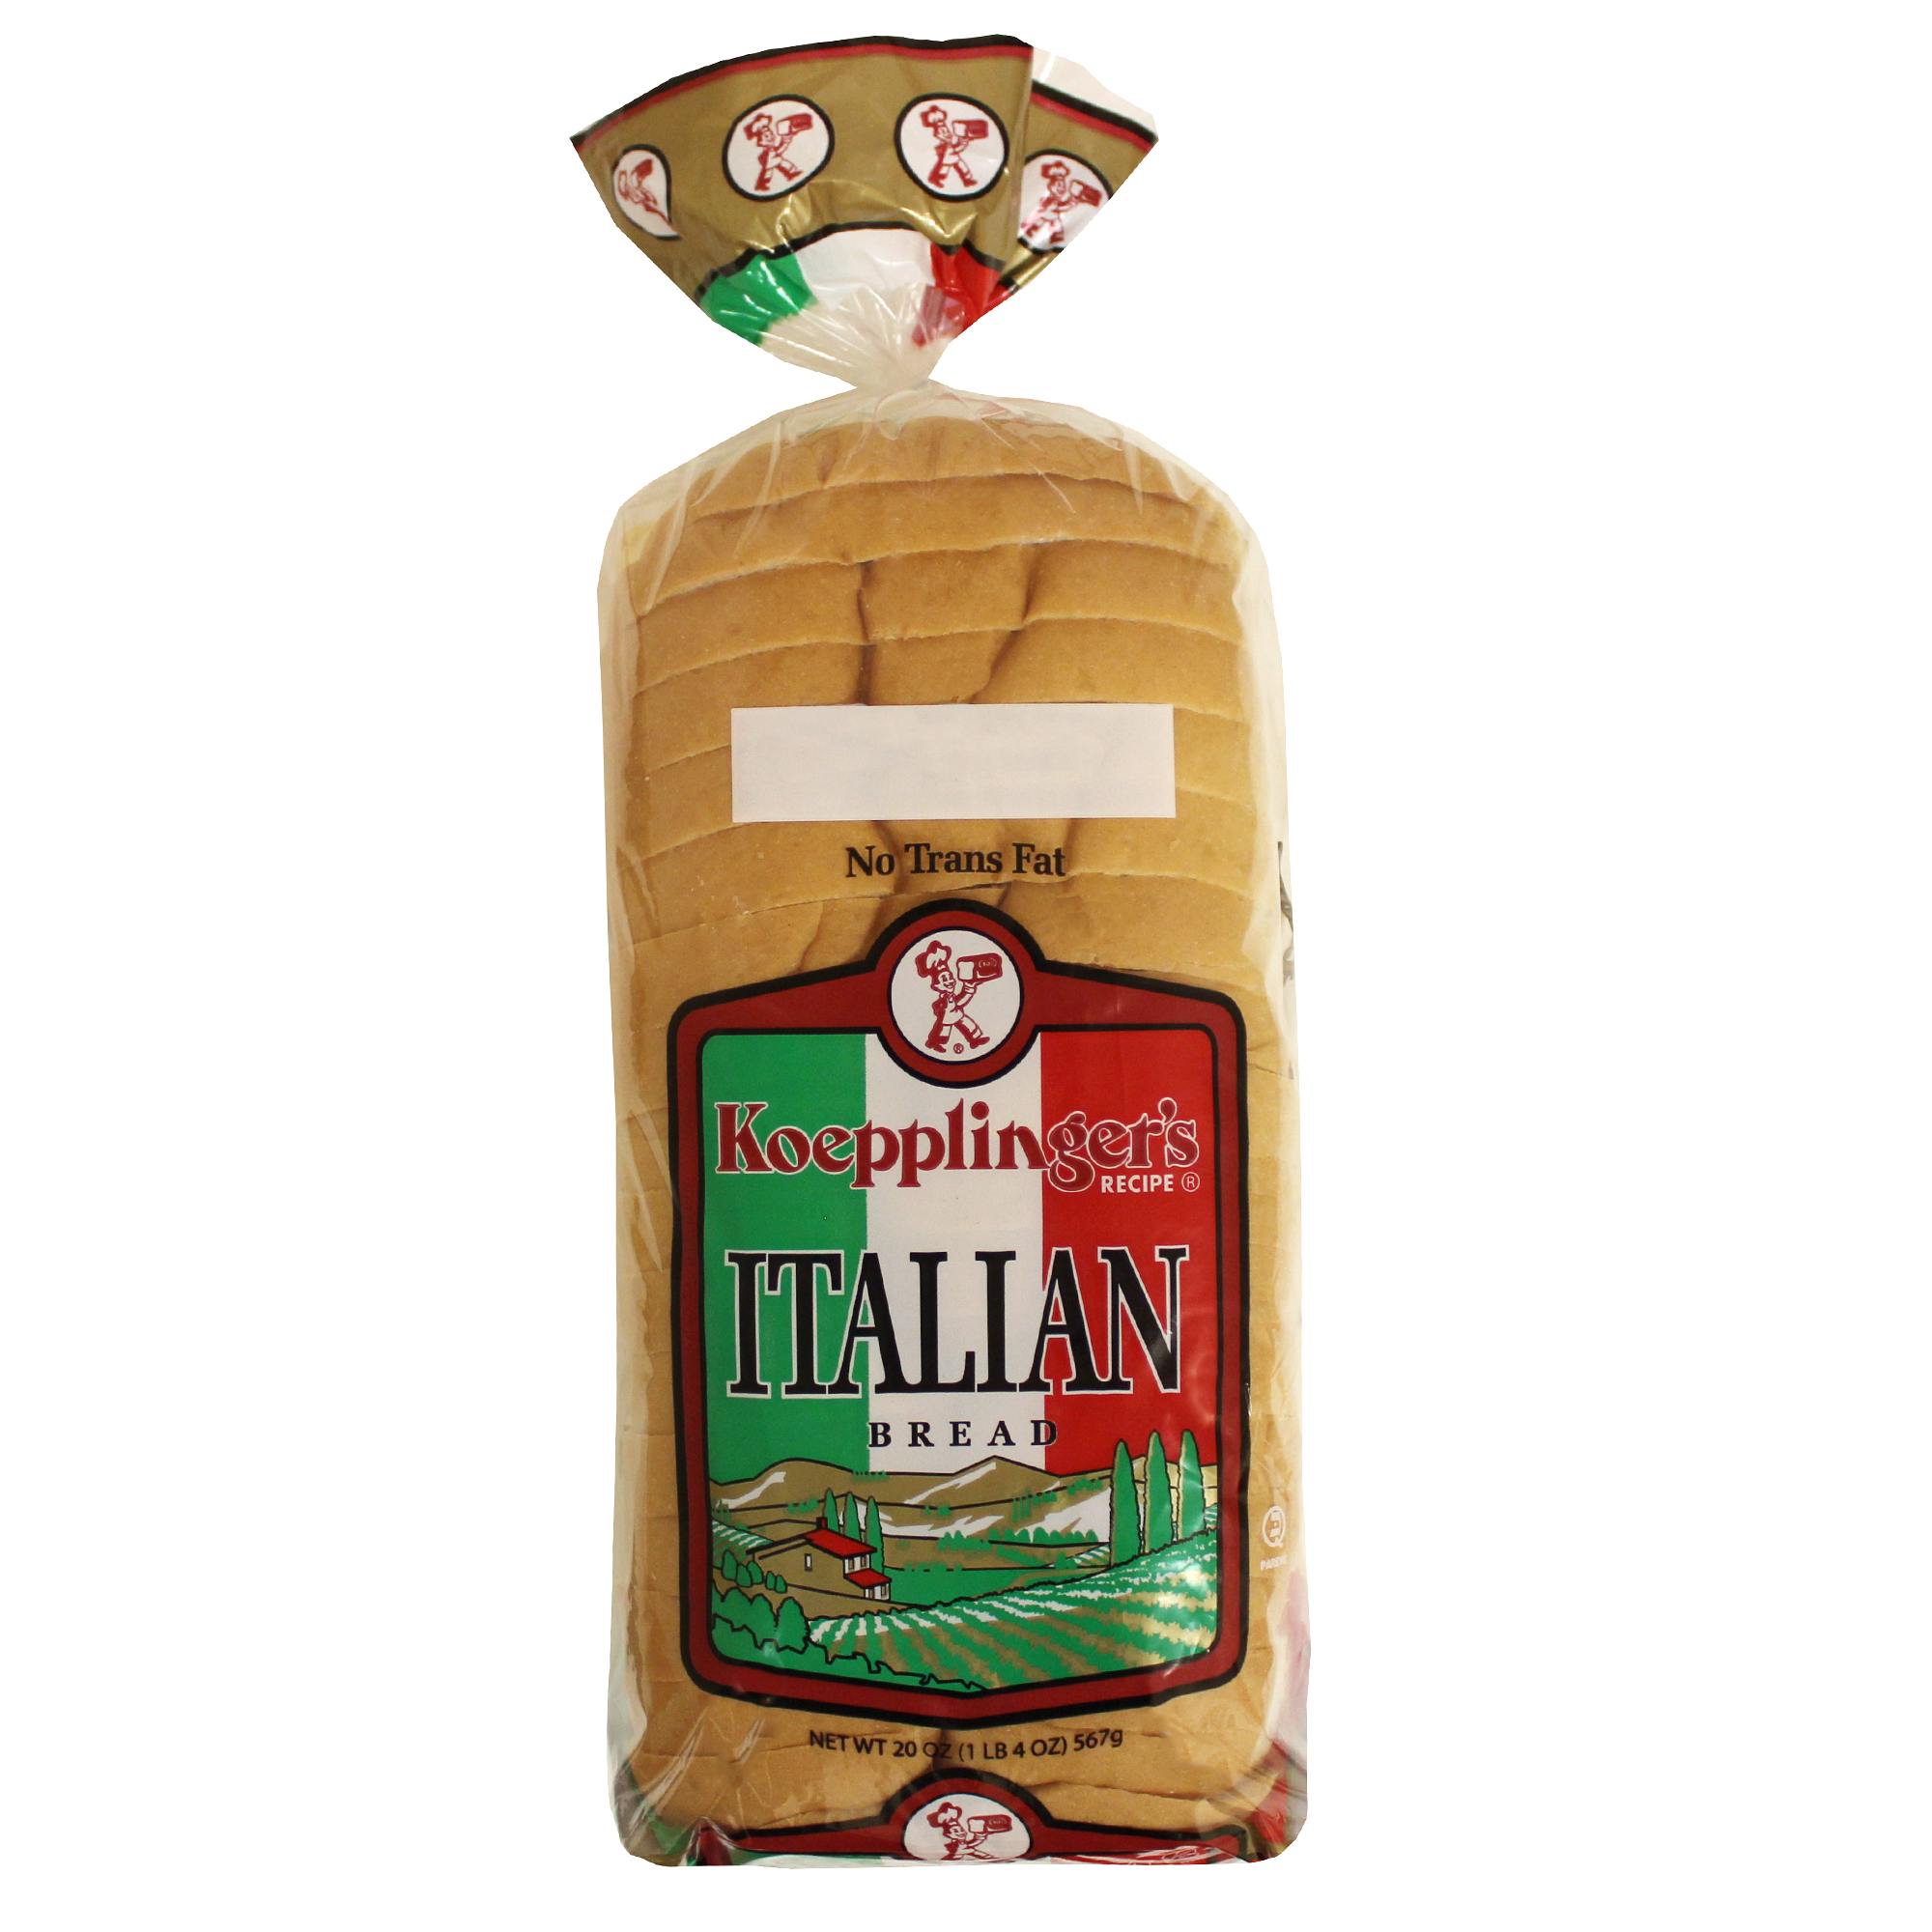 Koepplinger's Italian Bread, 20 oz.